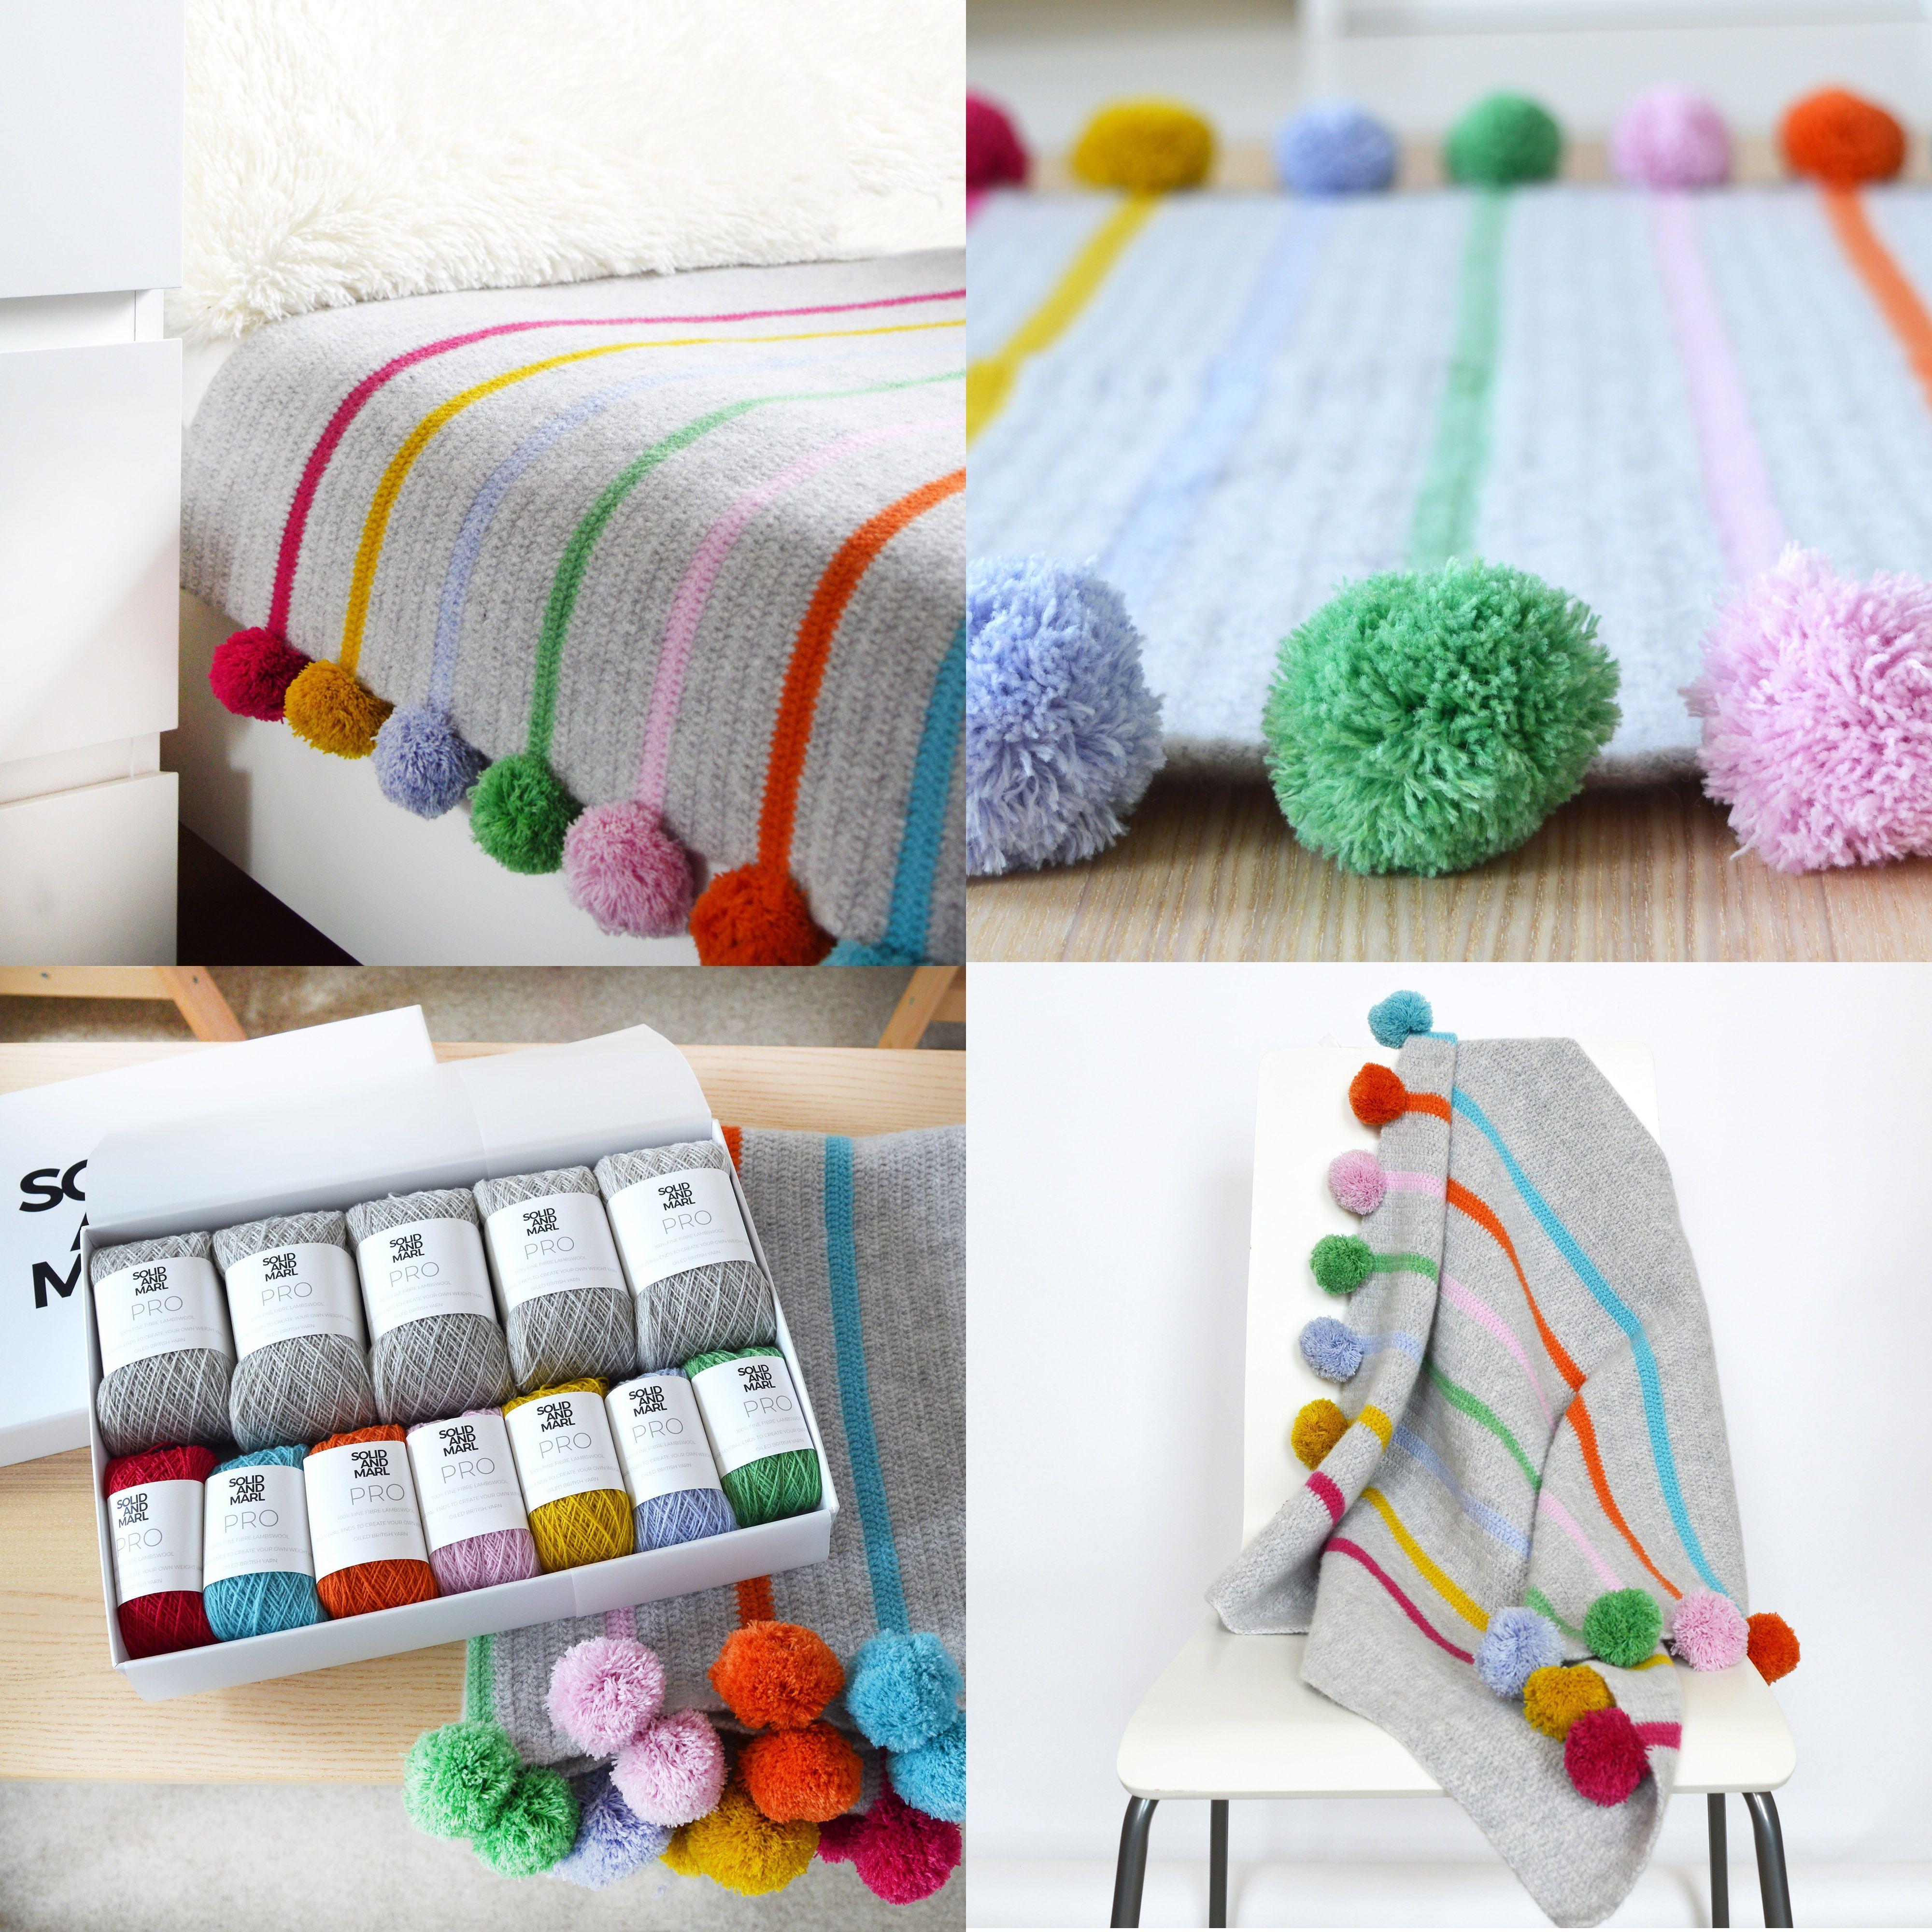 Pom Pom And Stripe Crochet Blanket Kit Solid And Marl Crochet Blanket Kit Crochet Kit Striped Crochet Blanket